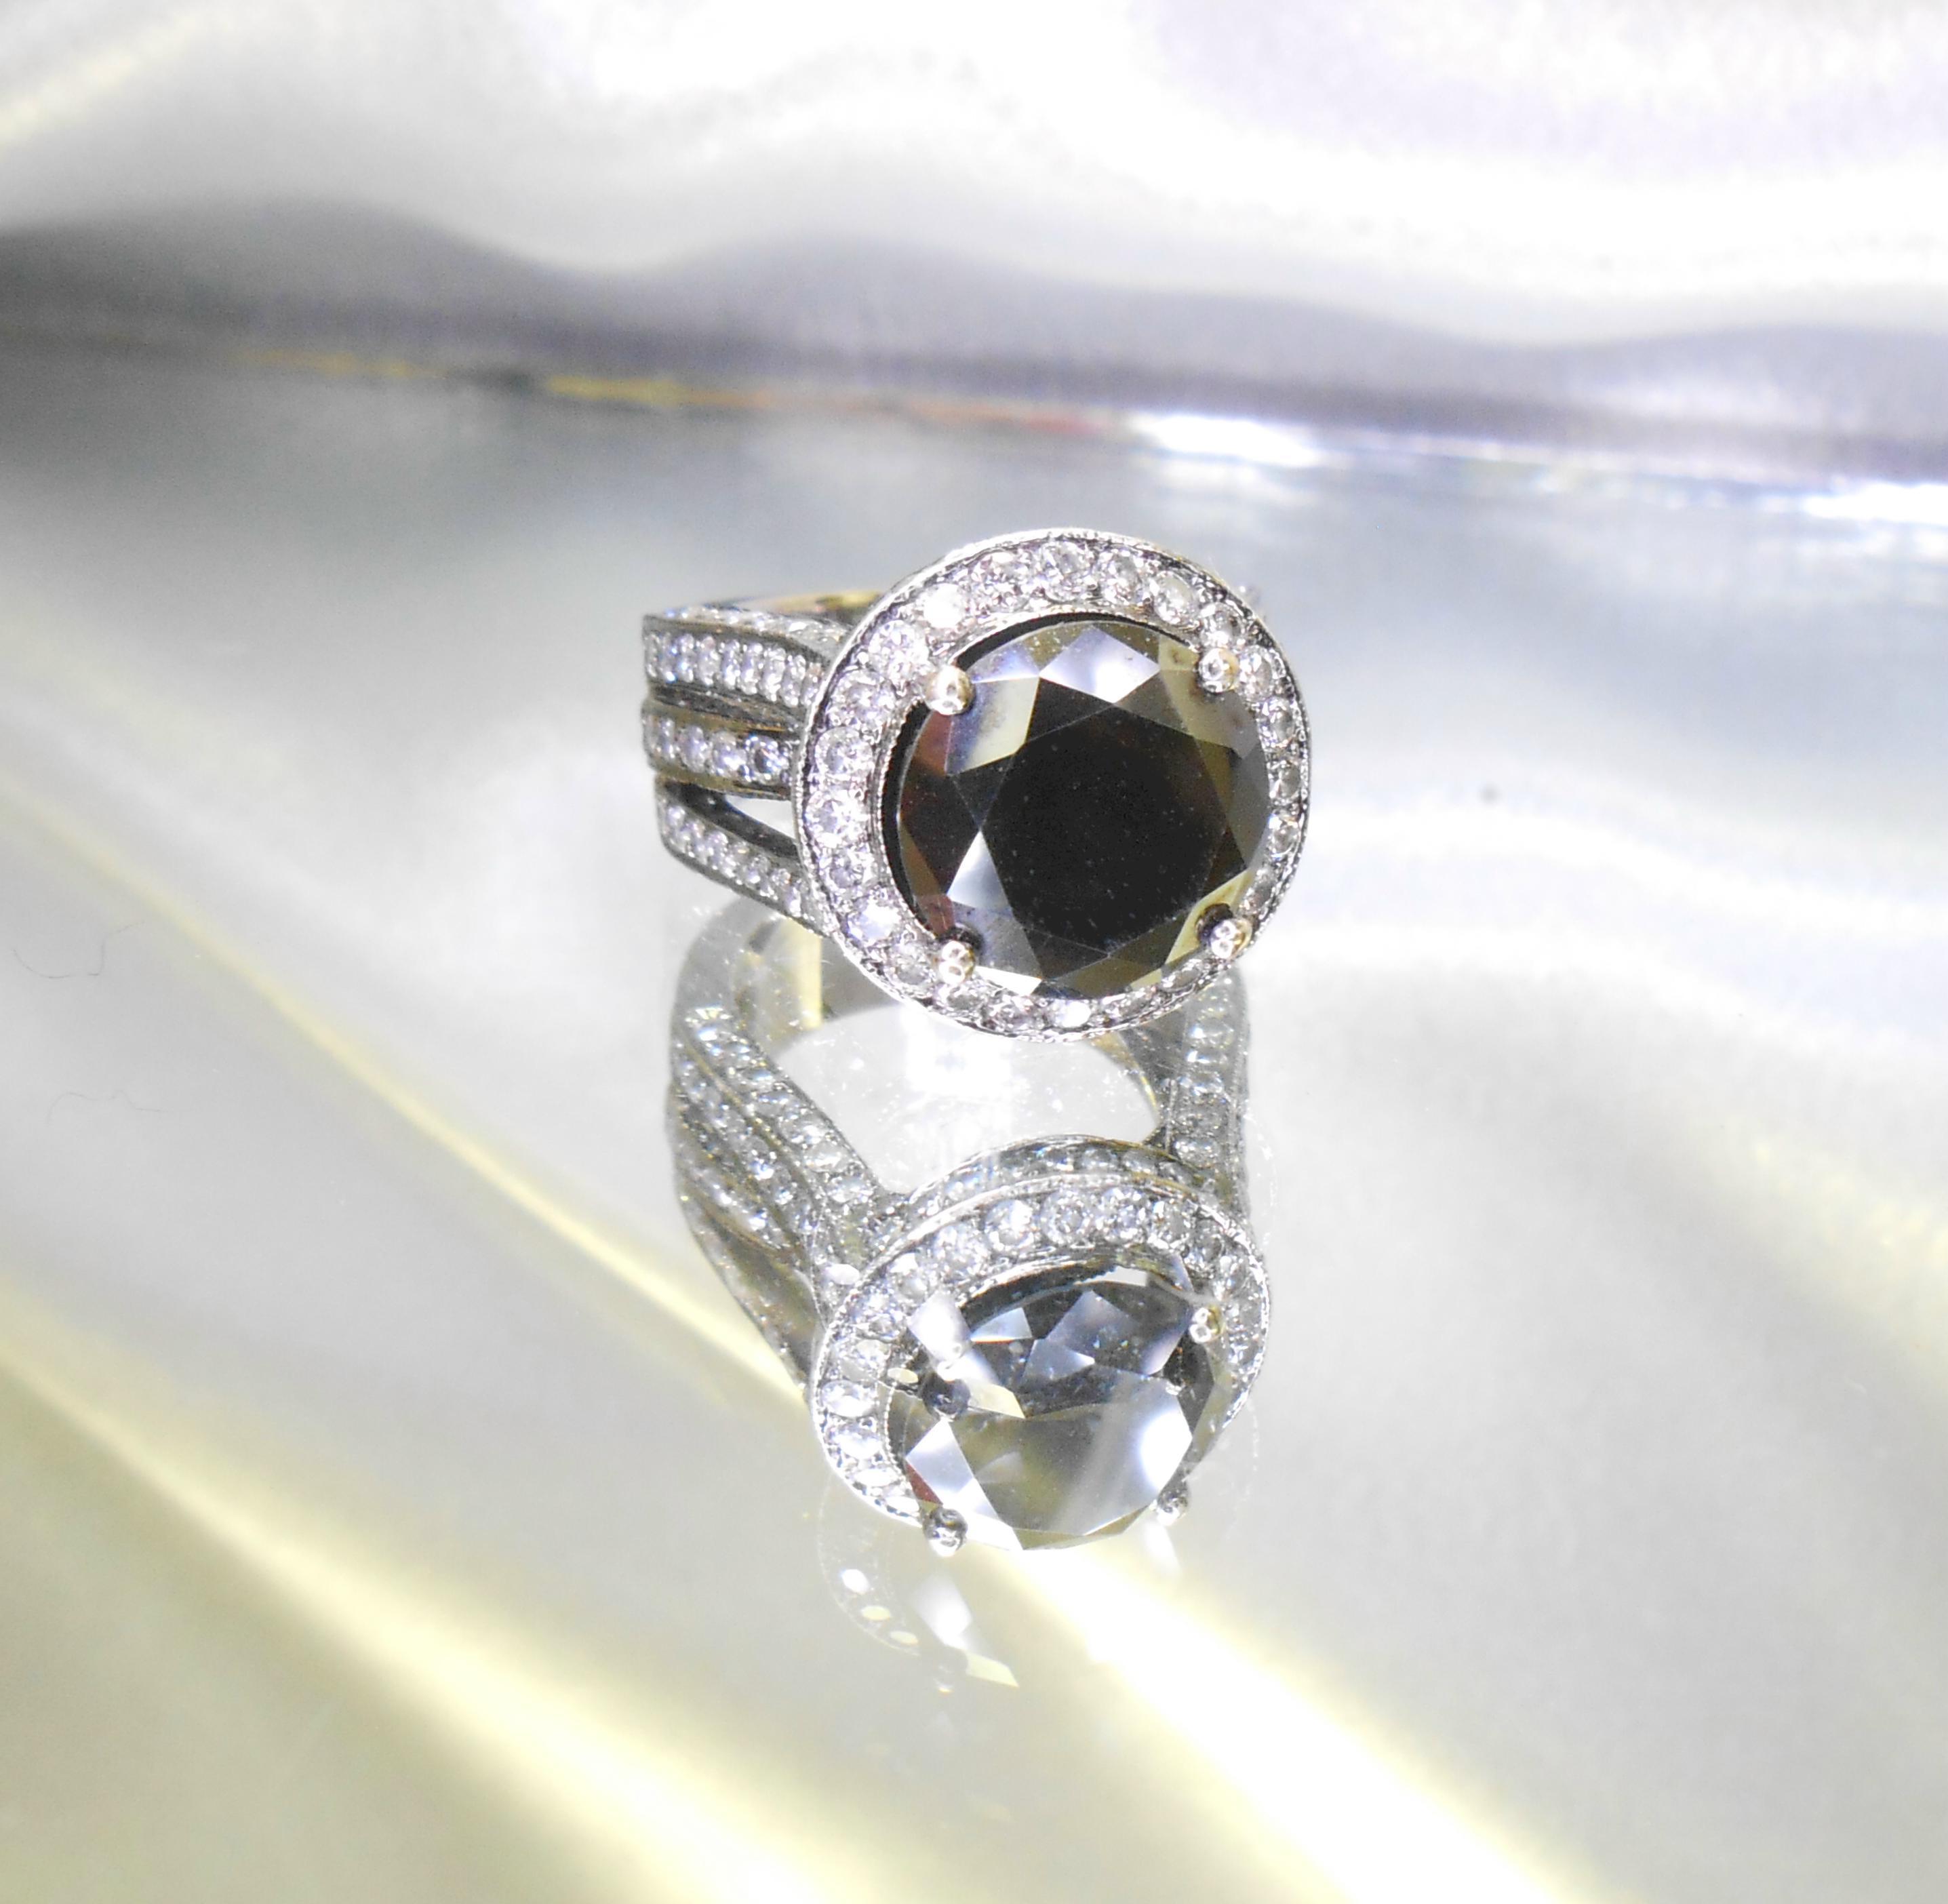 Corner Jewelers Jacksonville NC Gallery